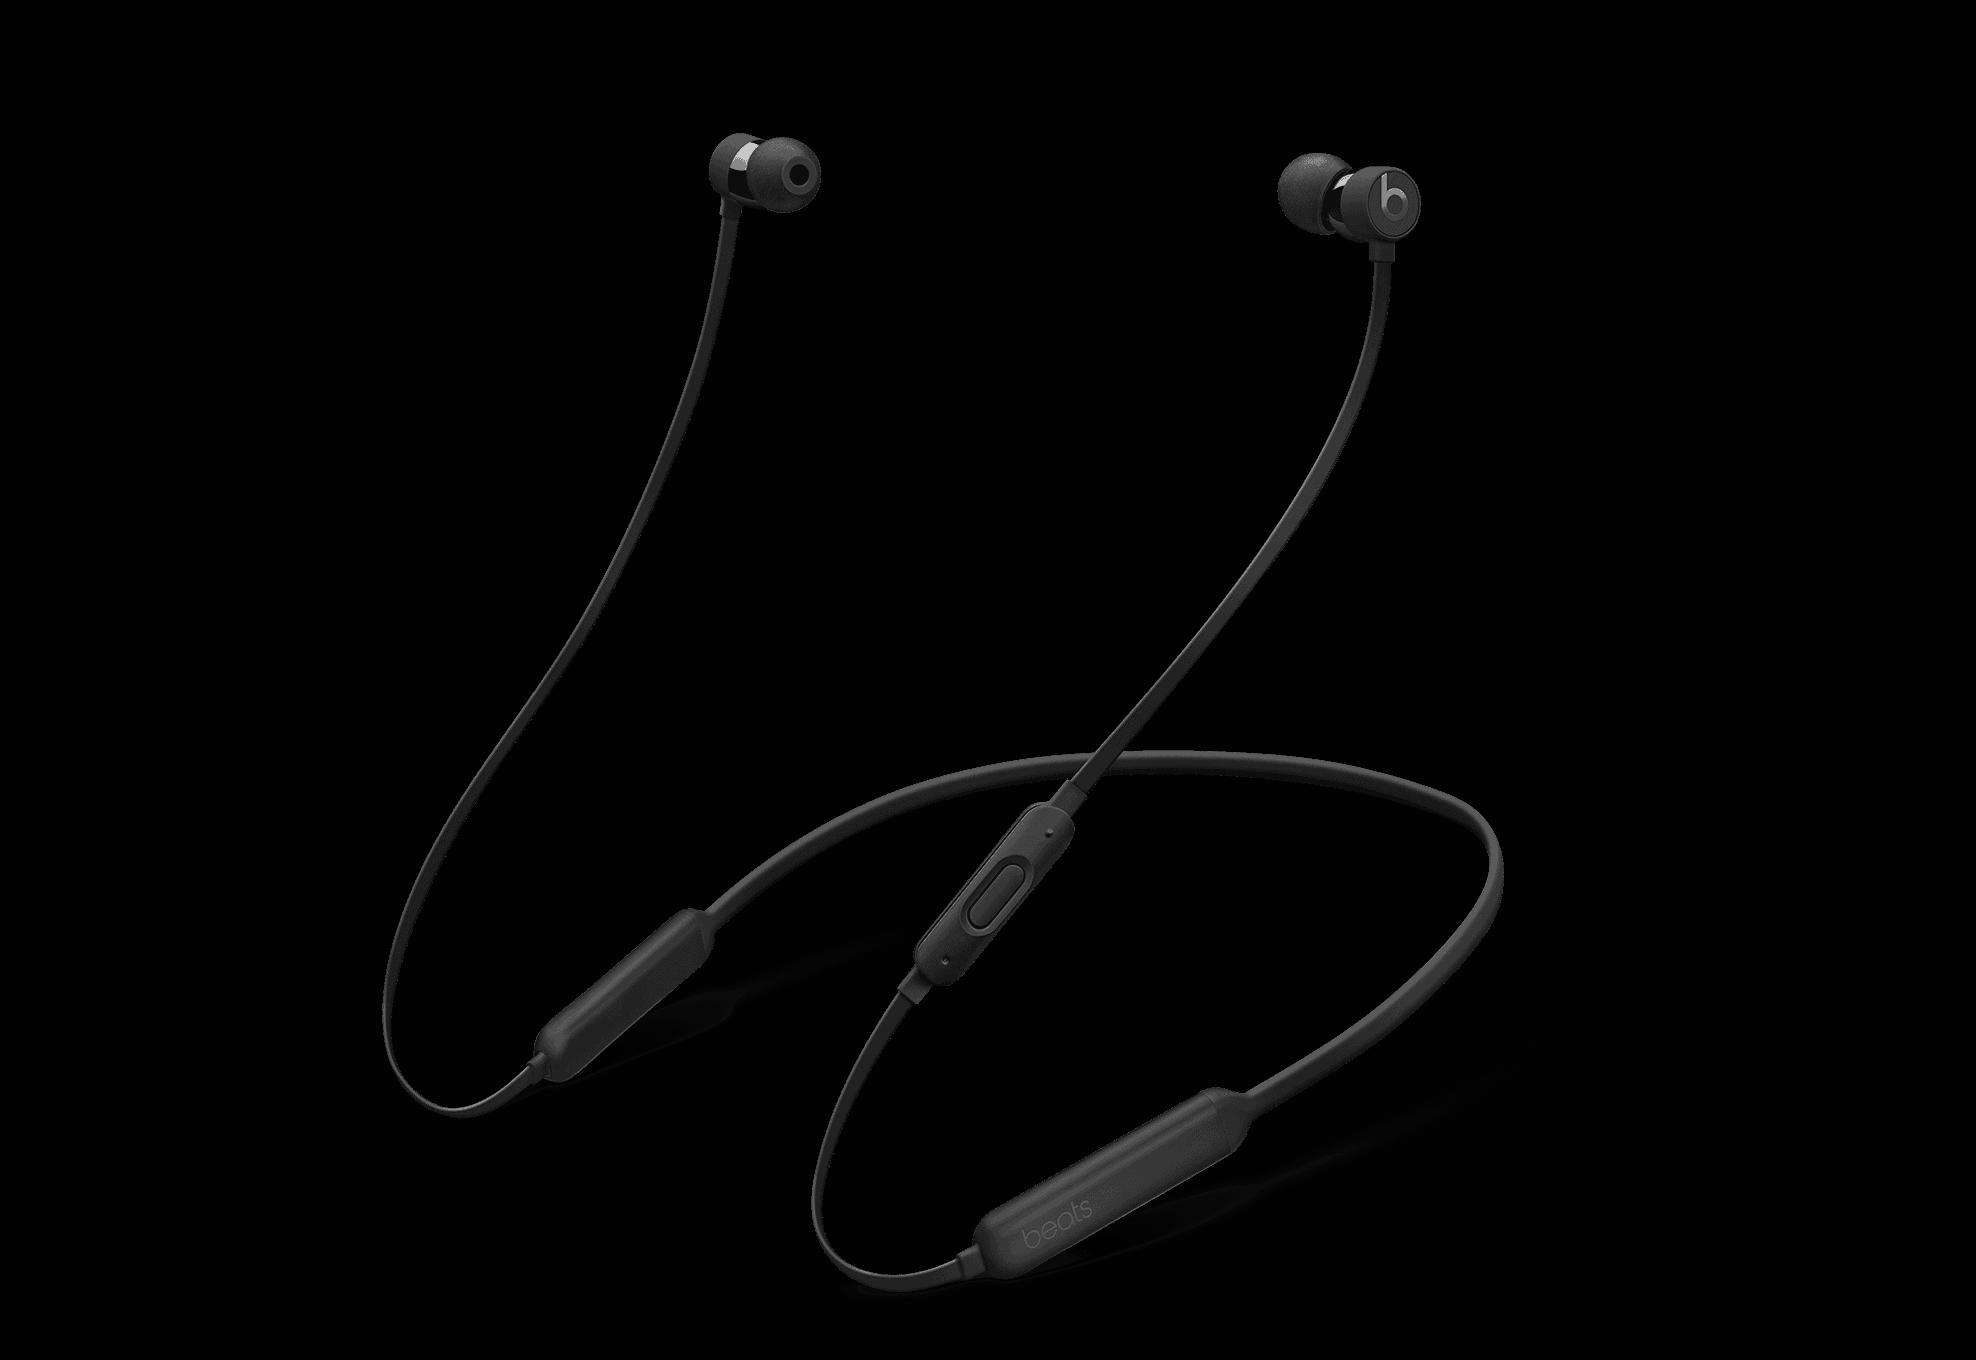 BeatsX Wireless Earphones - Apple W1 Headphone Chip, Class 1 Bluetooth, 8 Hours Of Listening Time - Black